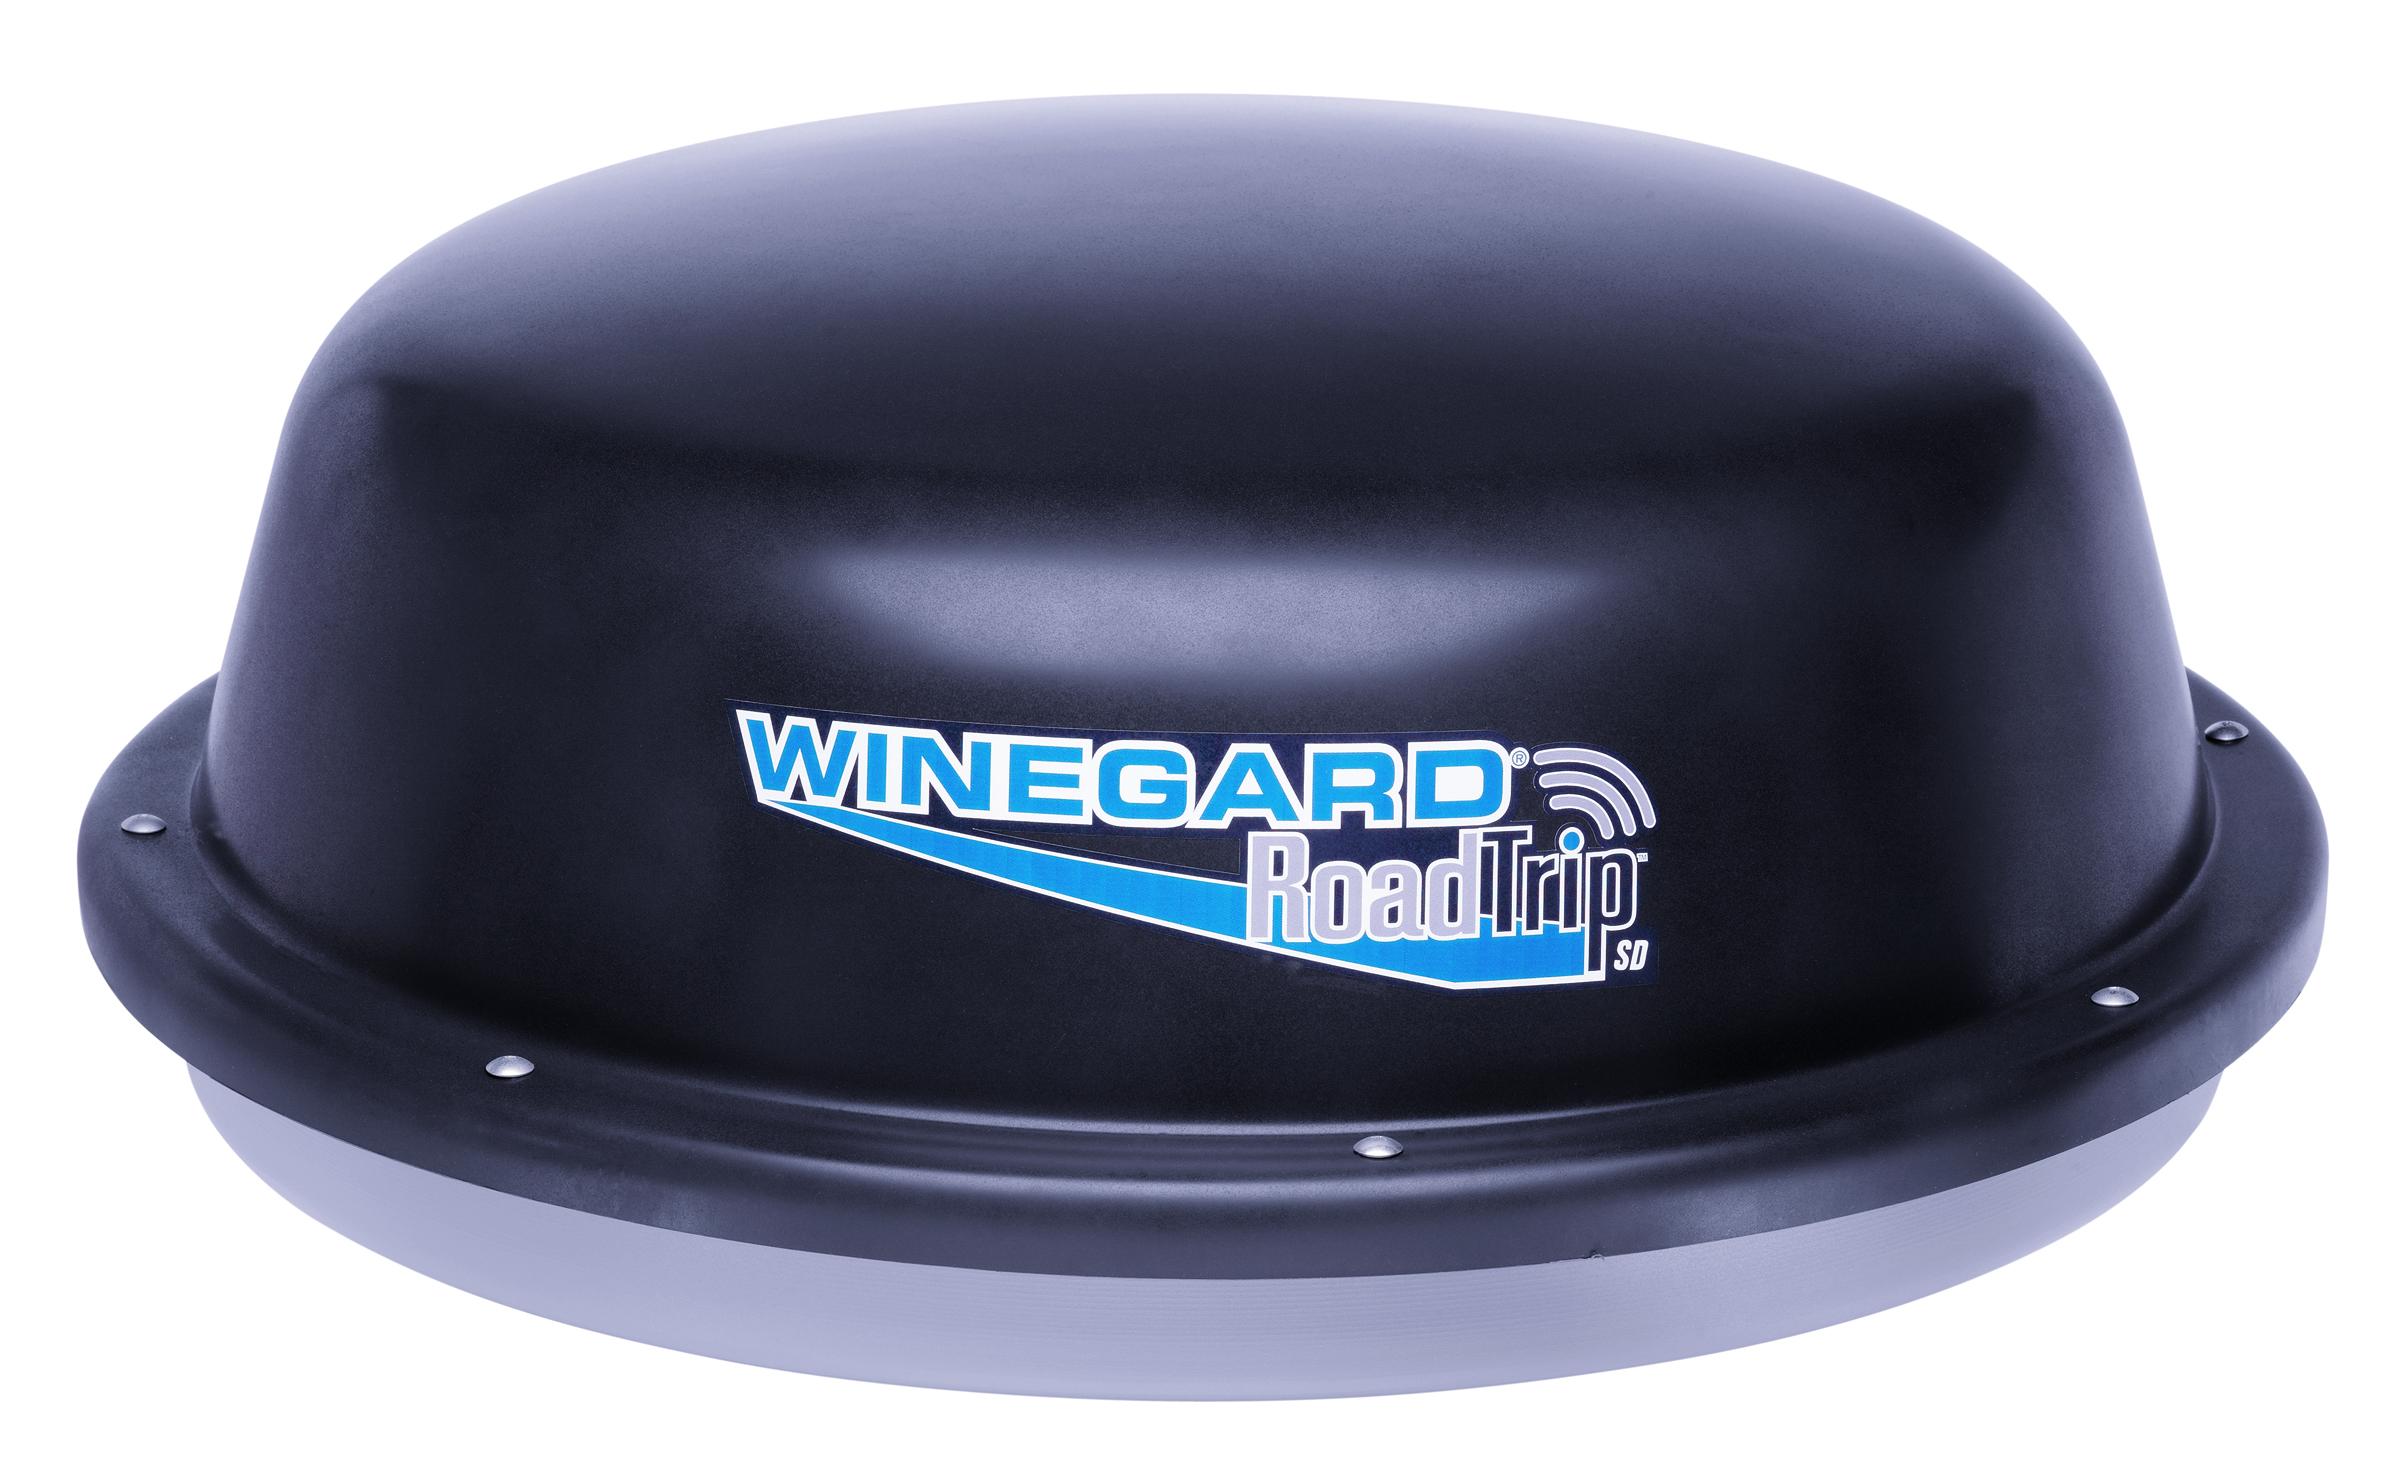 Winegard News Releases